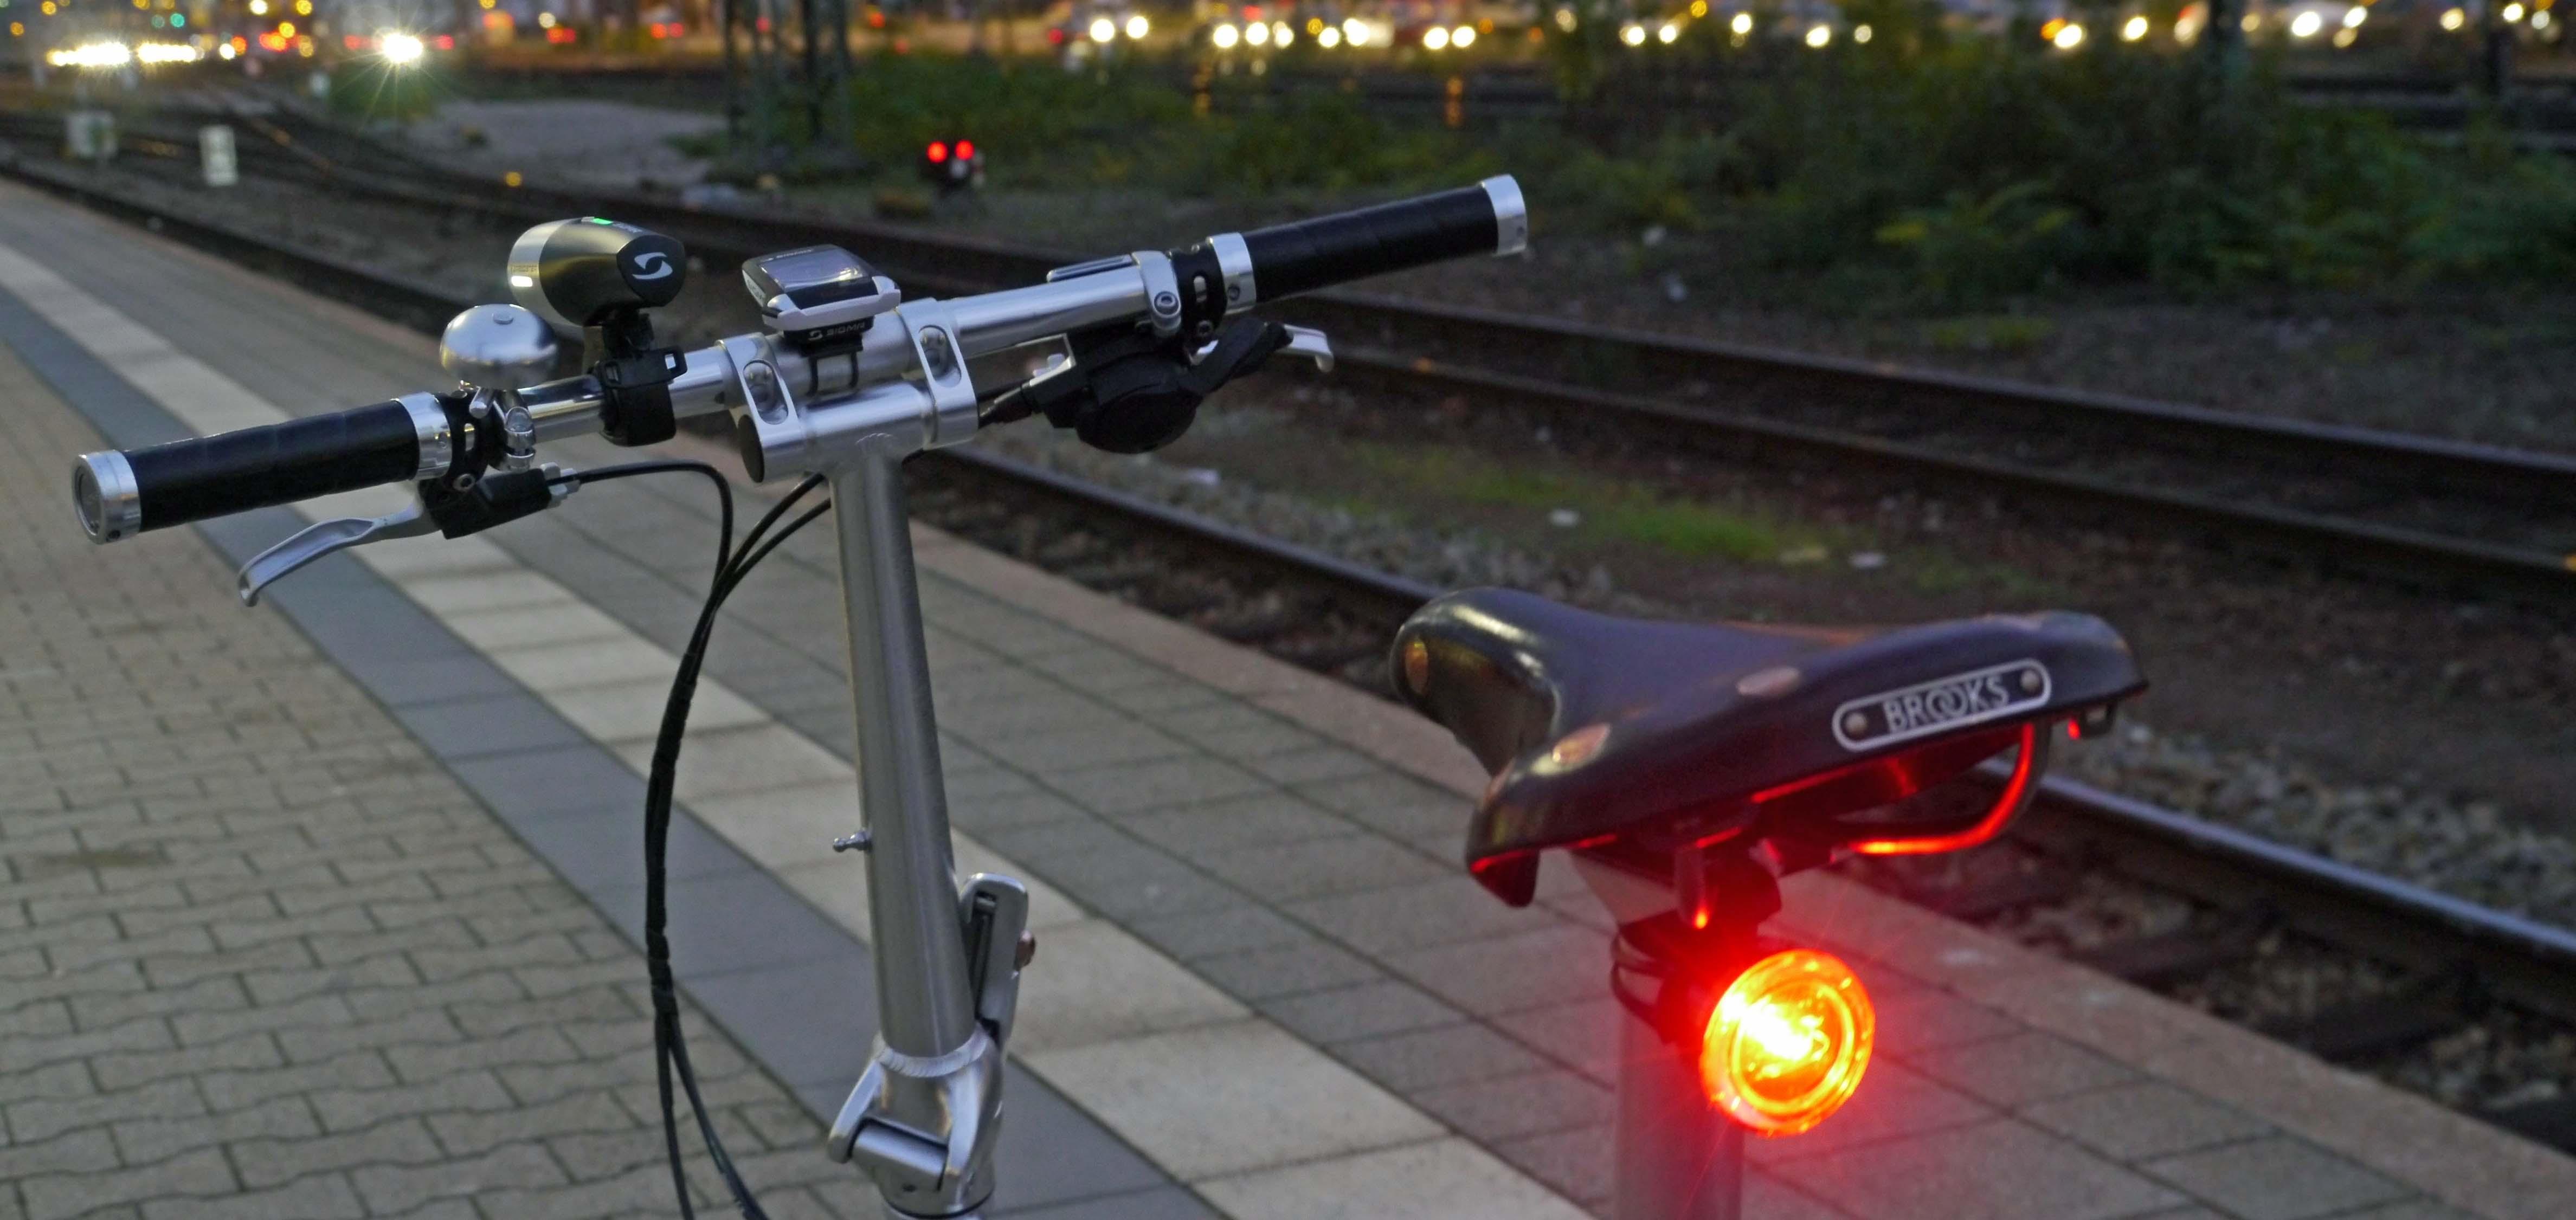 Задня фара велосипеда